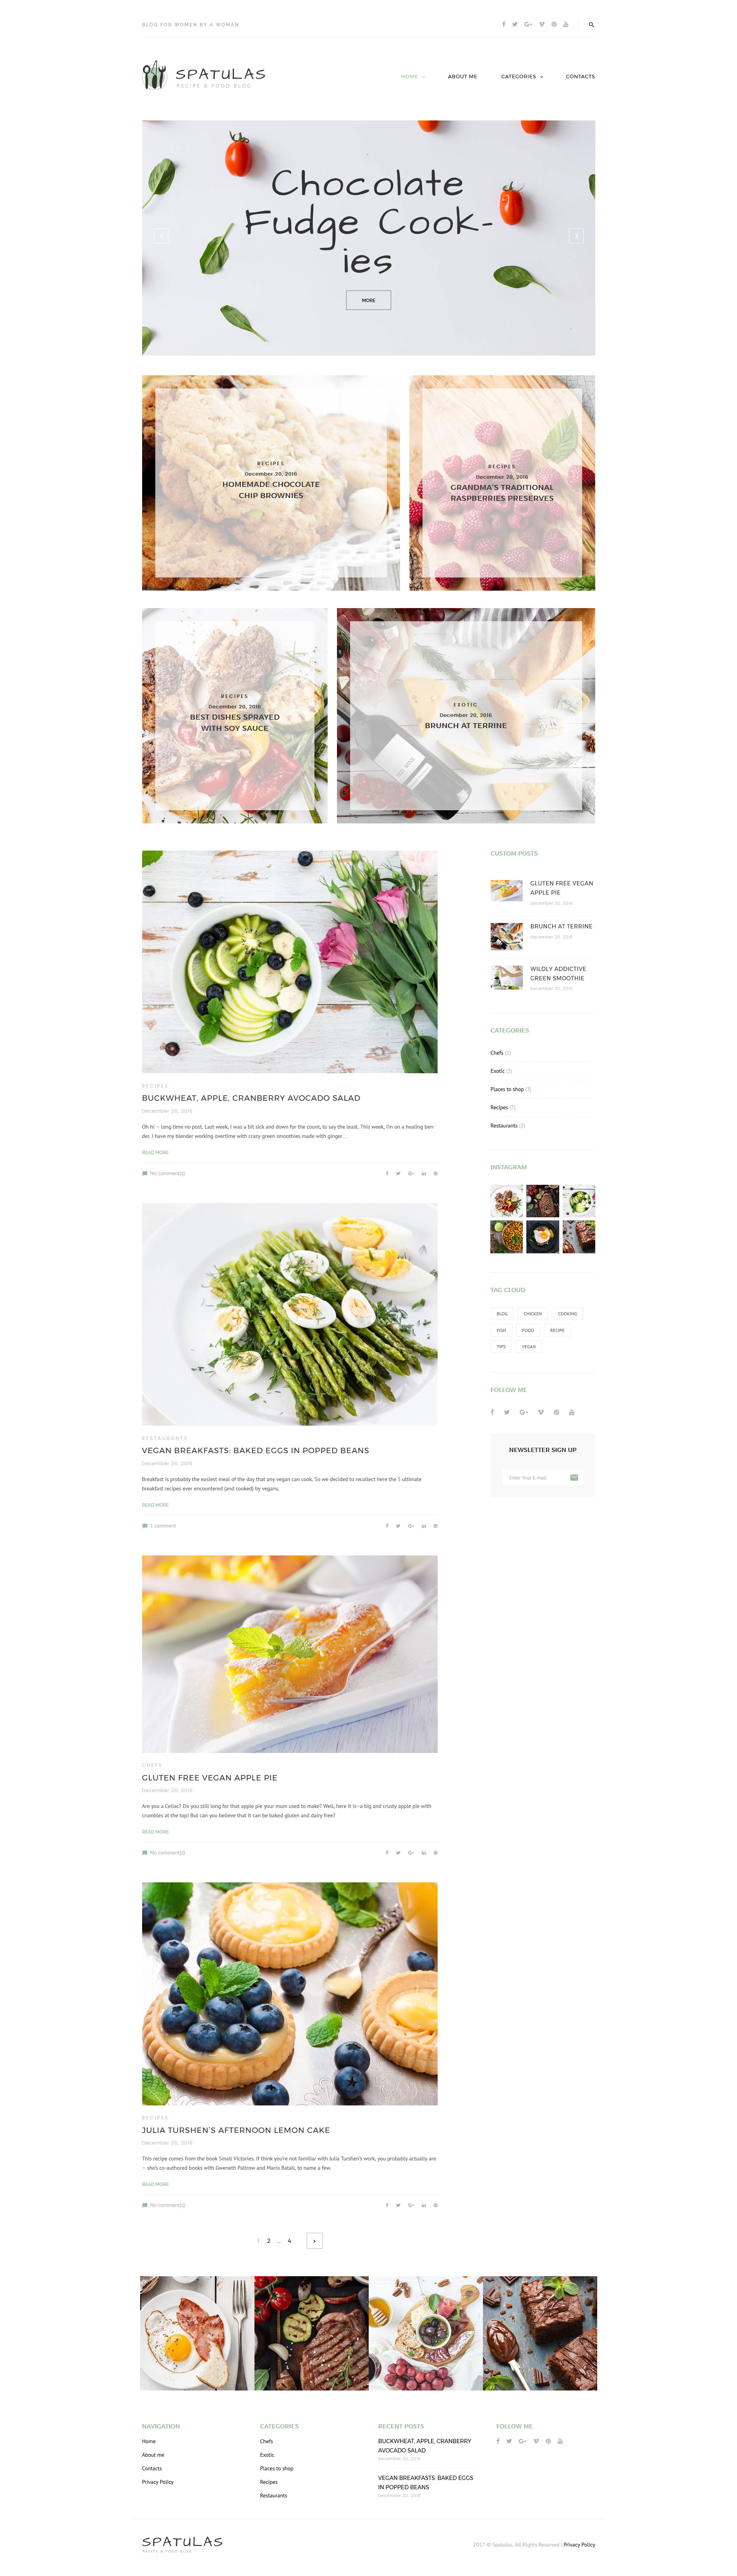 """Spatulas - Recipe & Food Blog"" - адаптивний WordPress шаблон №63601 - скріншот"